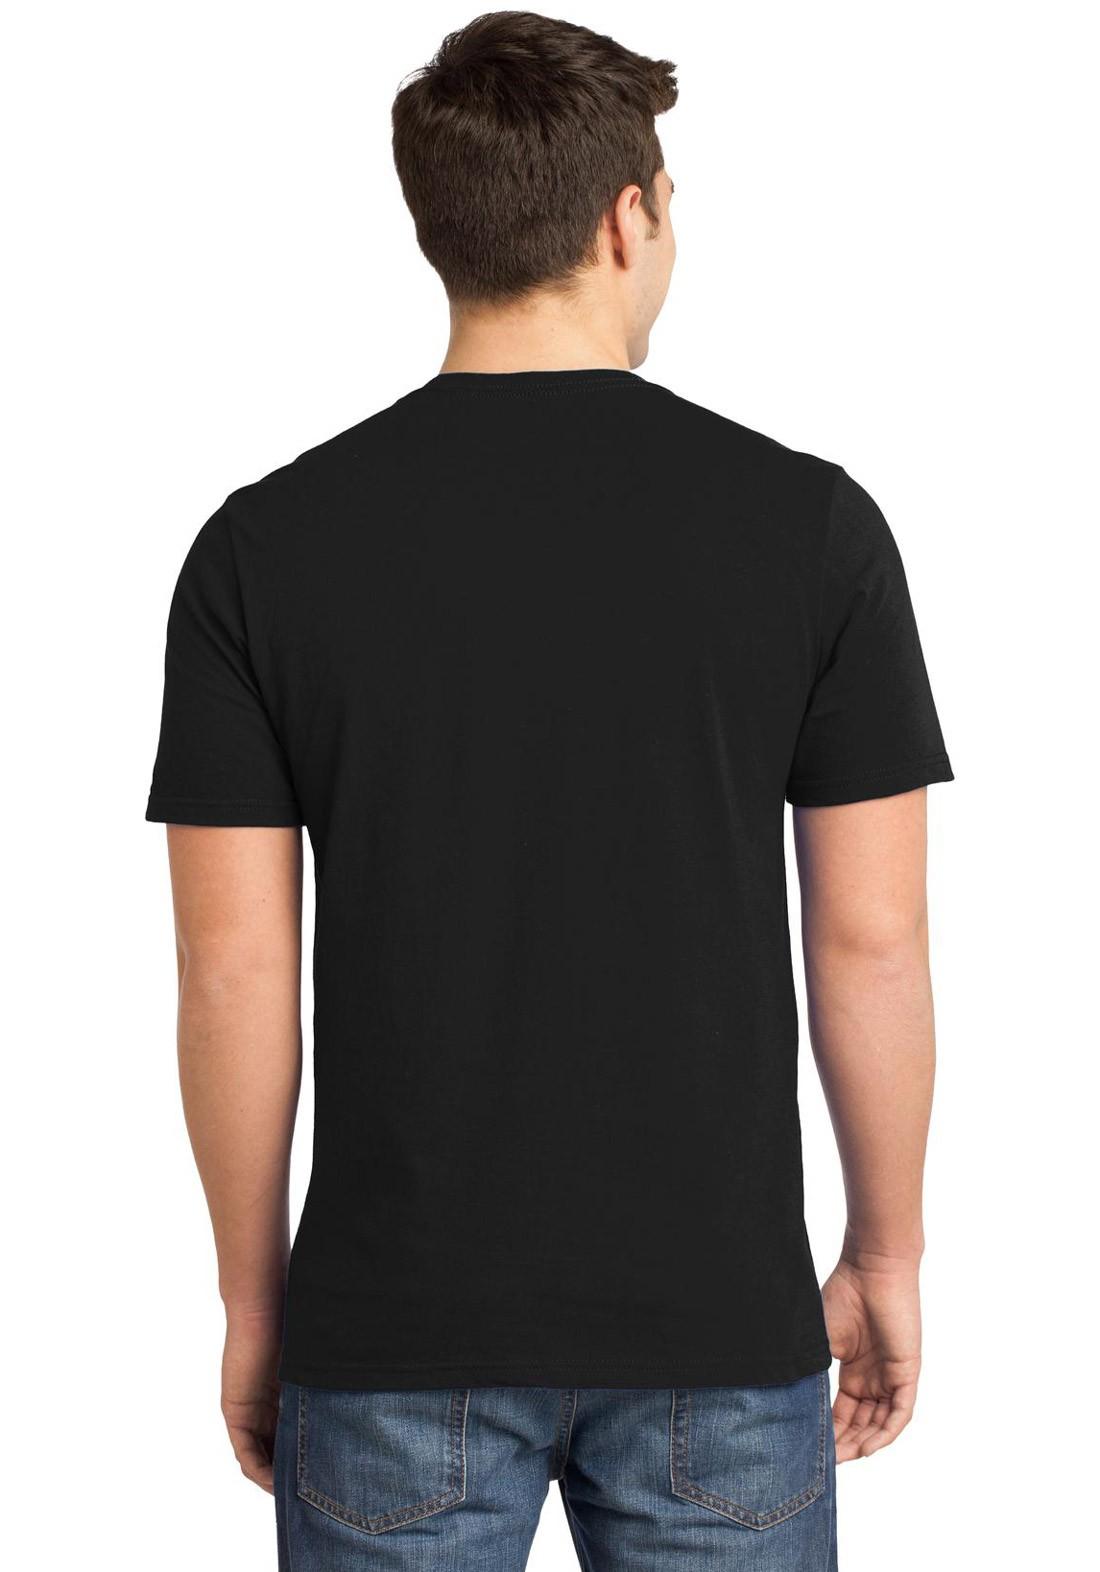 Camiseta Masculina Universitária Faculdade Psicologia